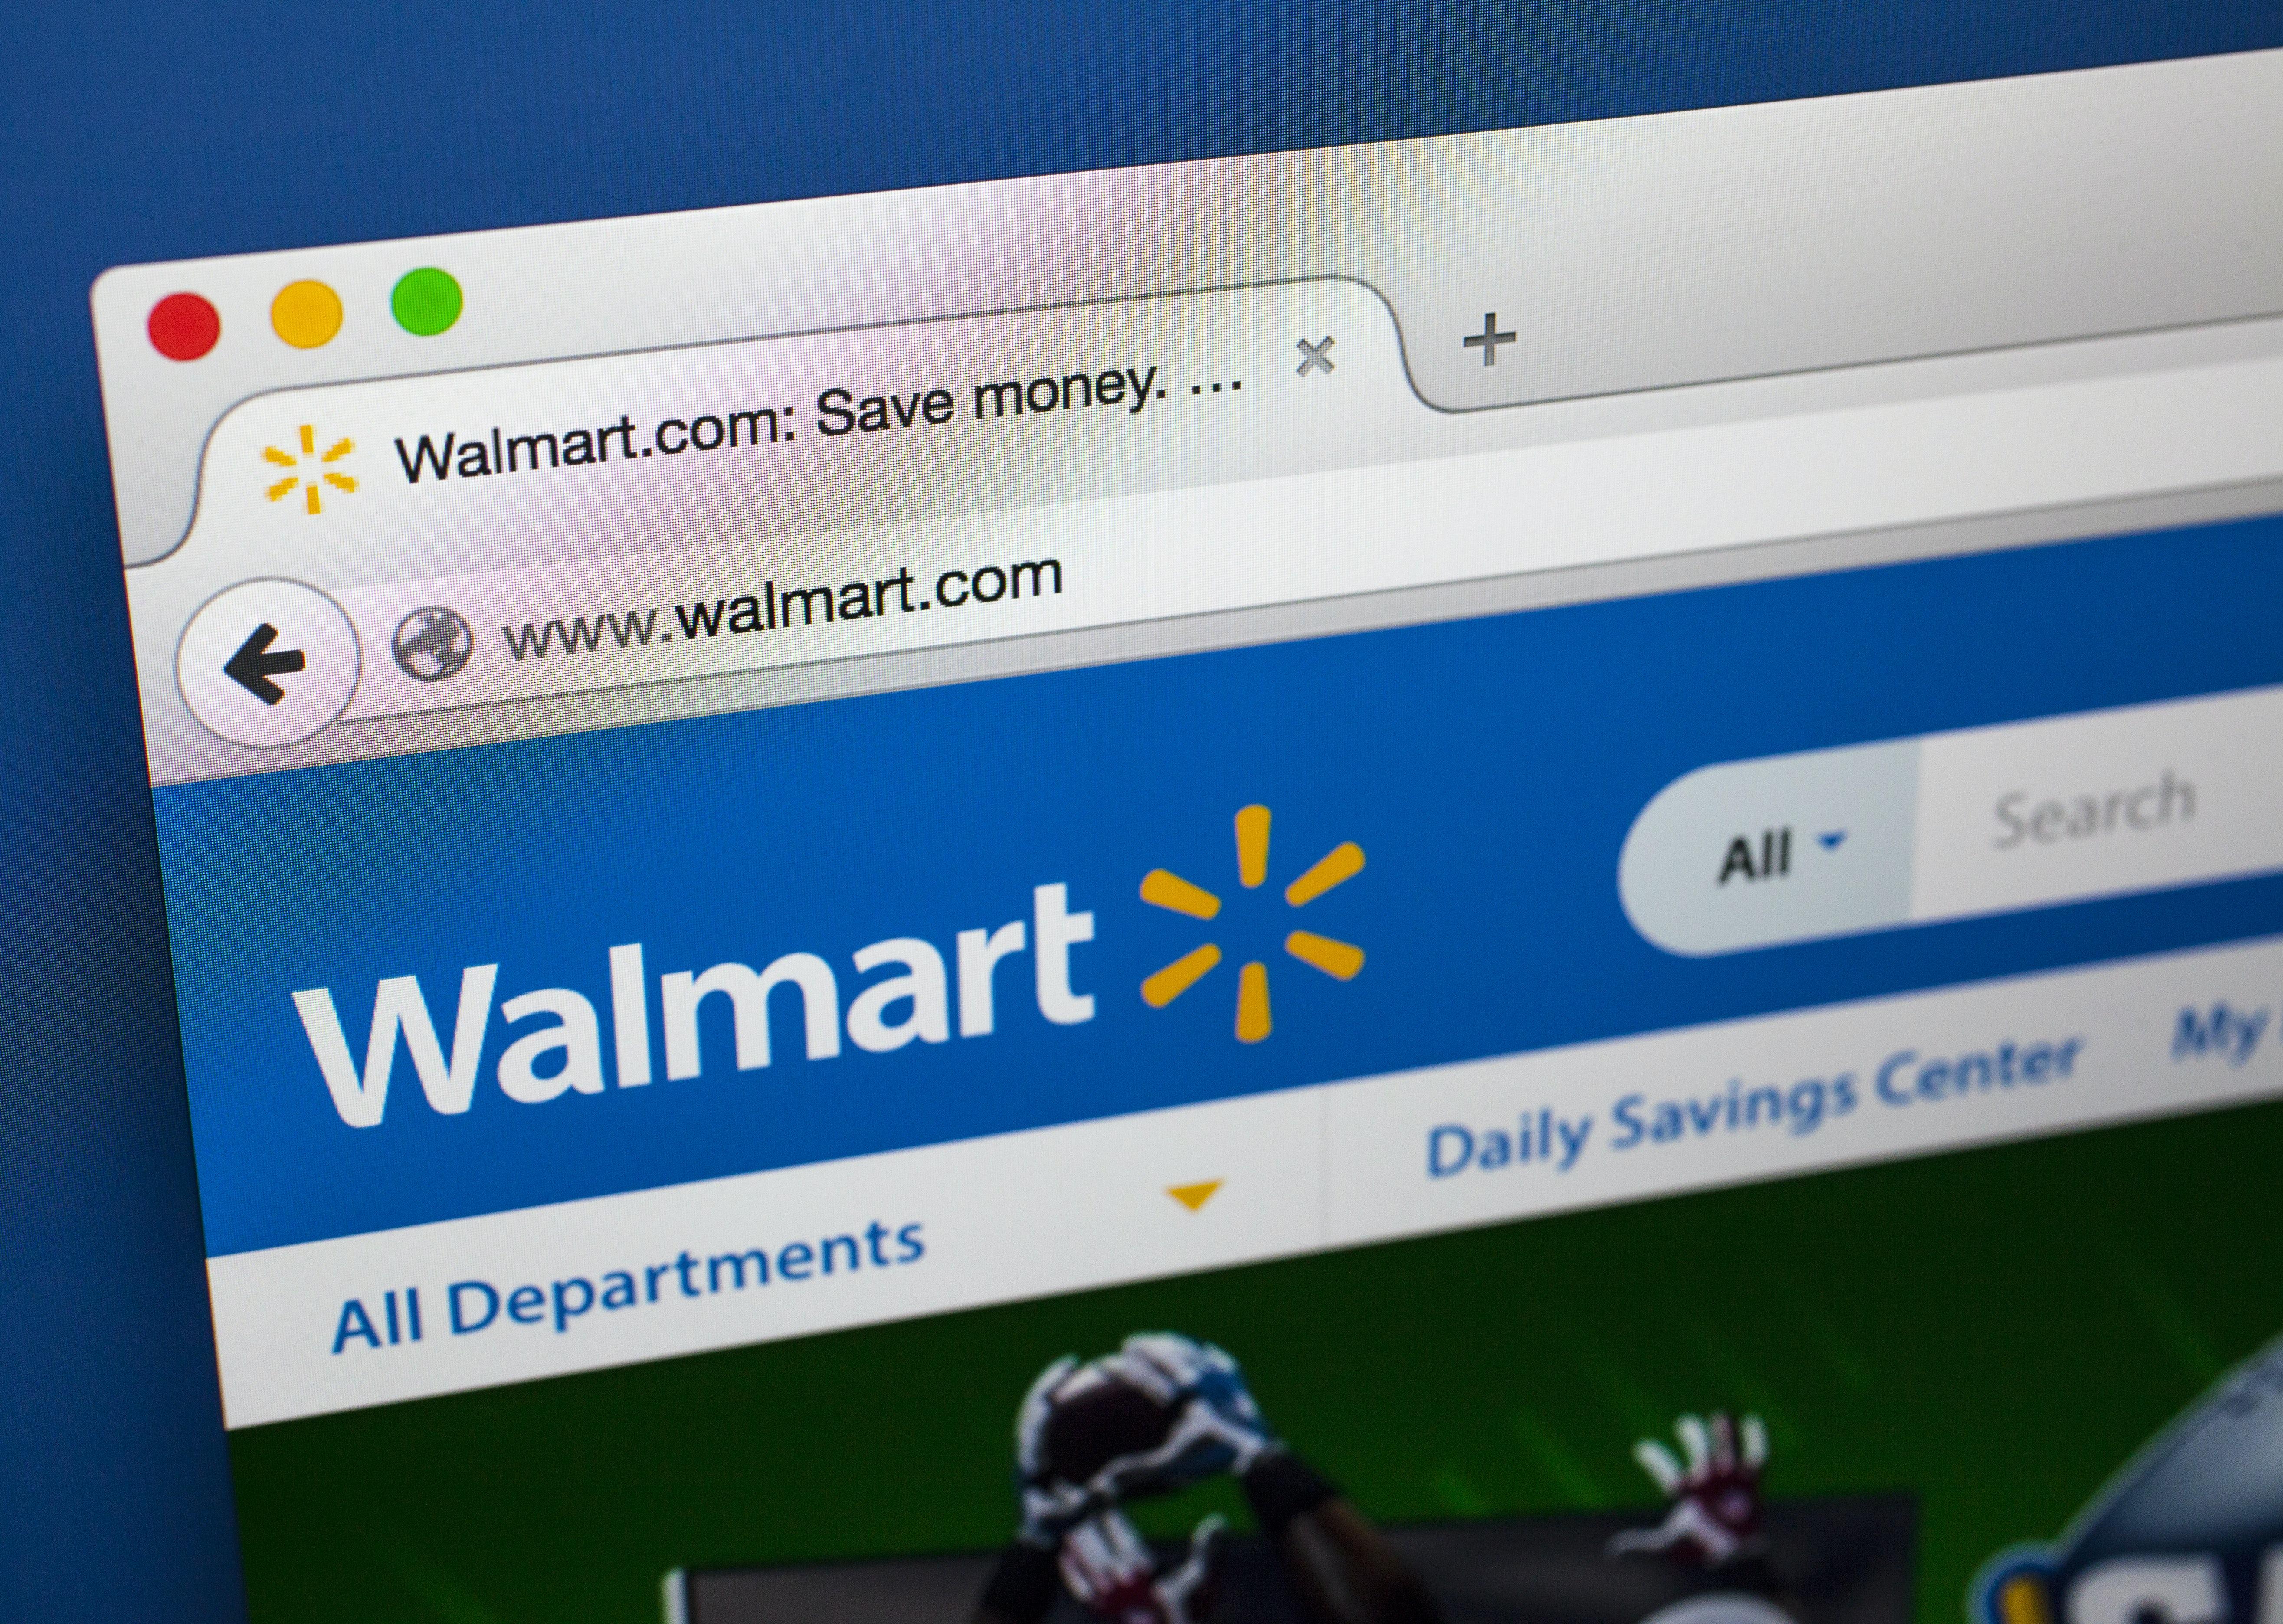 Walmart.com | Source: Shutterstock